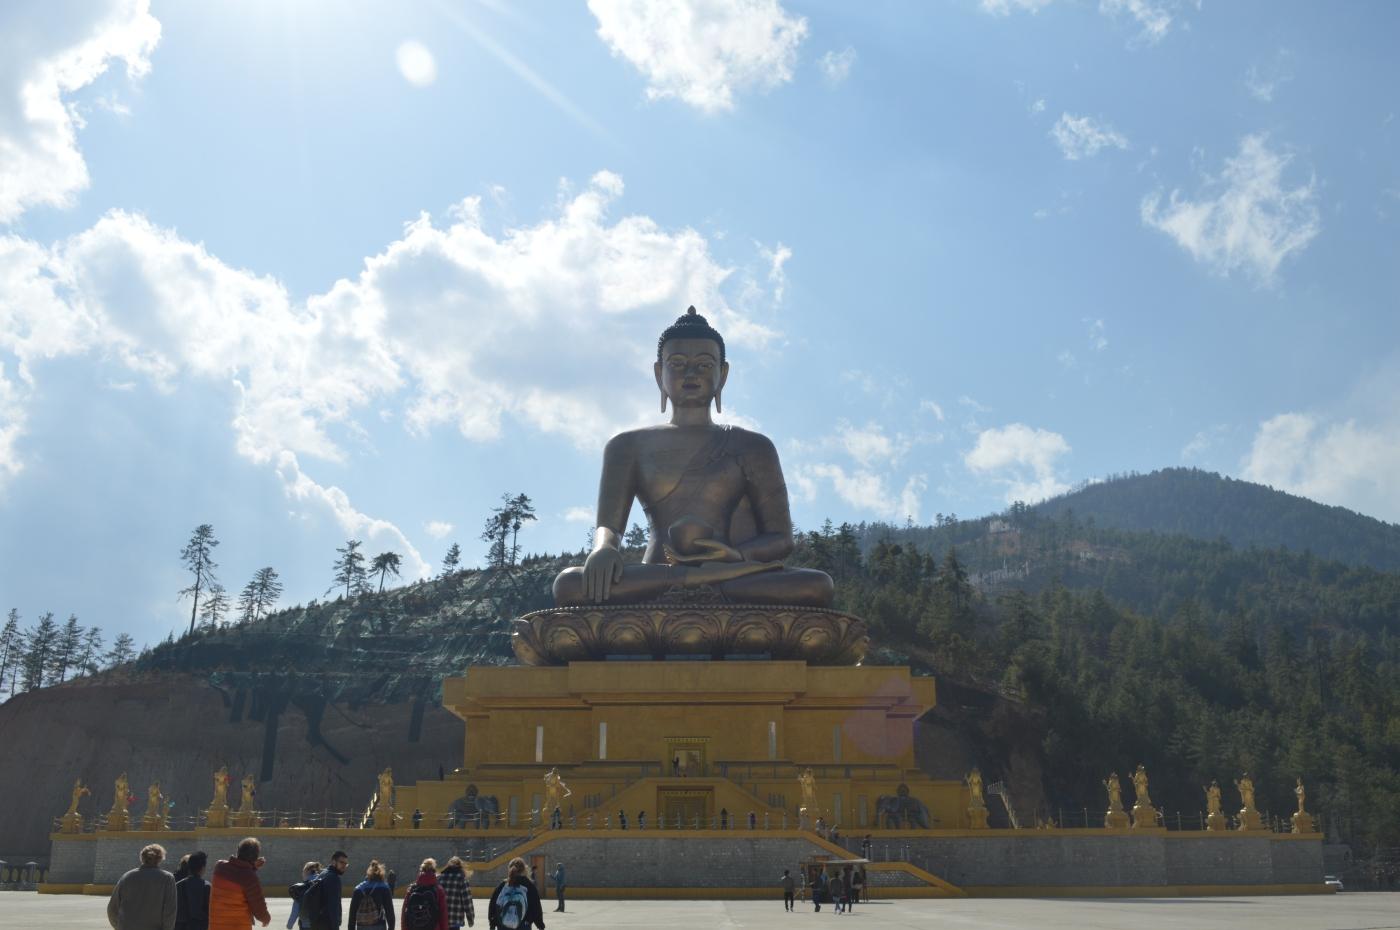 bhutan, nature, afurthershore, blog, altruism, troy-wilkinson, thoughtful, Buddha Point, monument, meditation, mindfulness